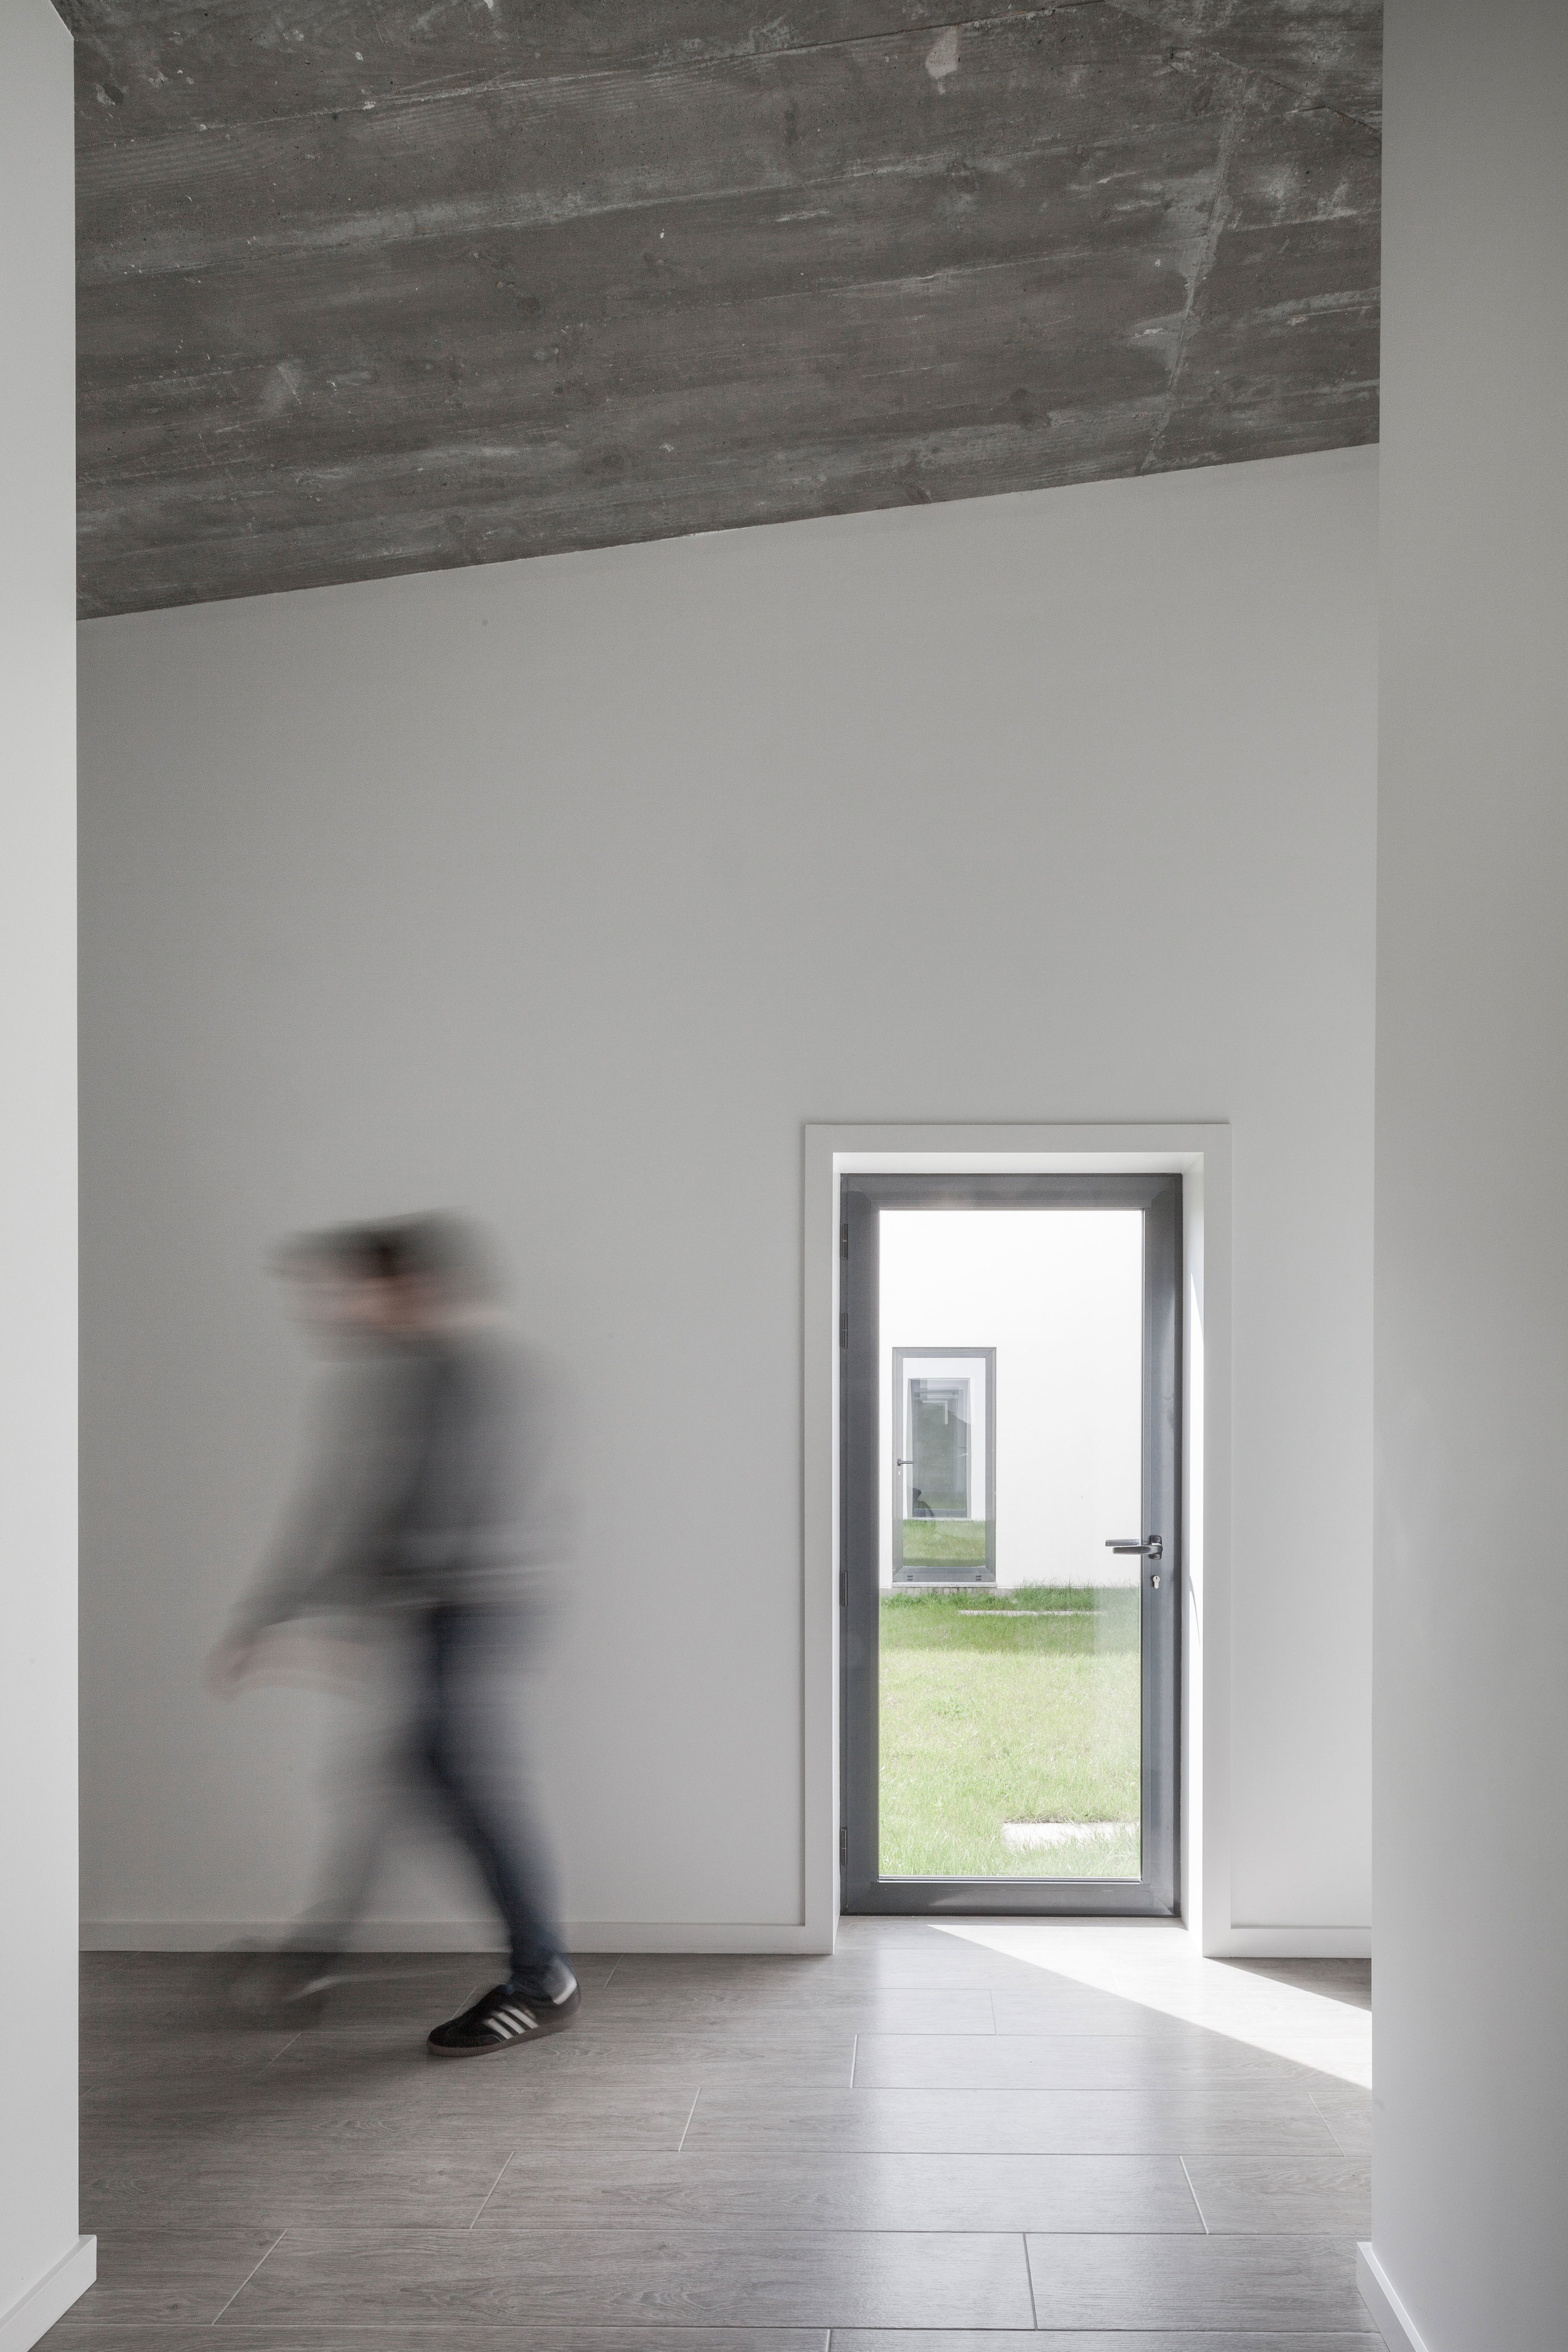 PROD_Open_patio_house_corridor_view1.jpg